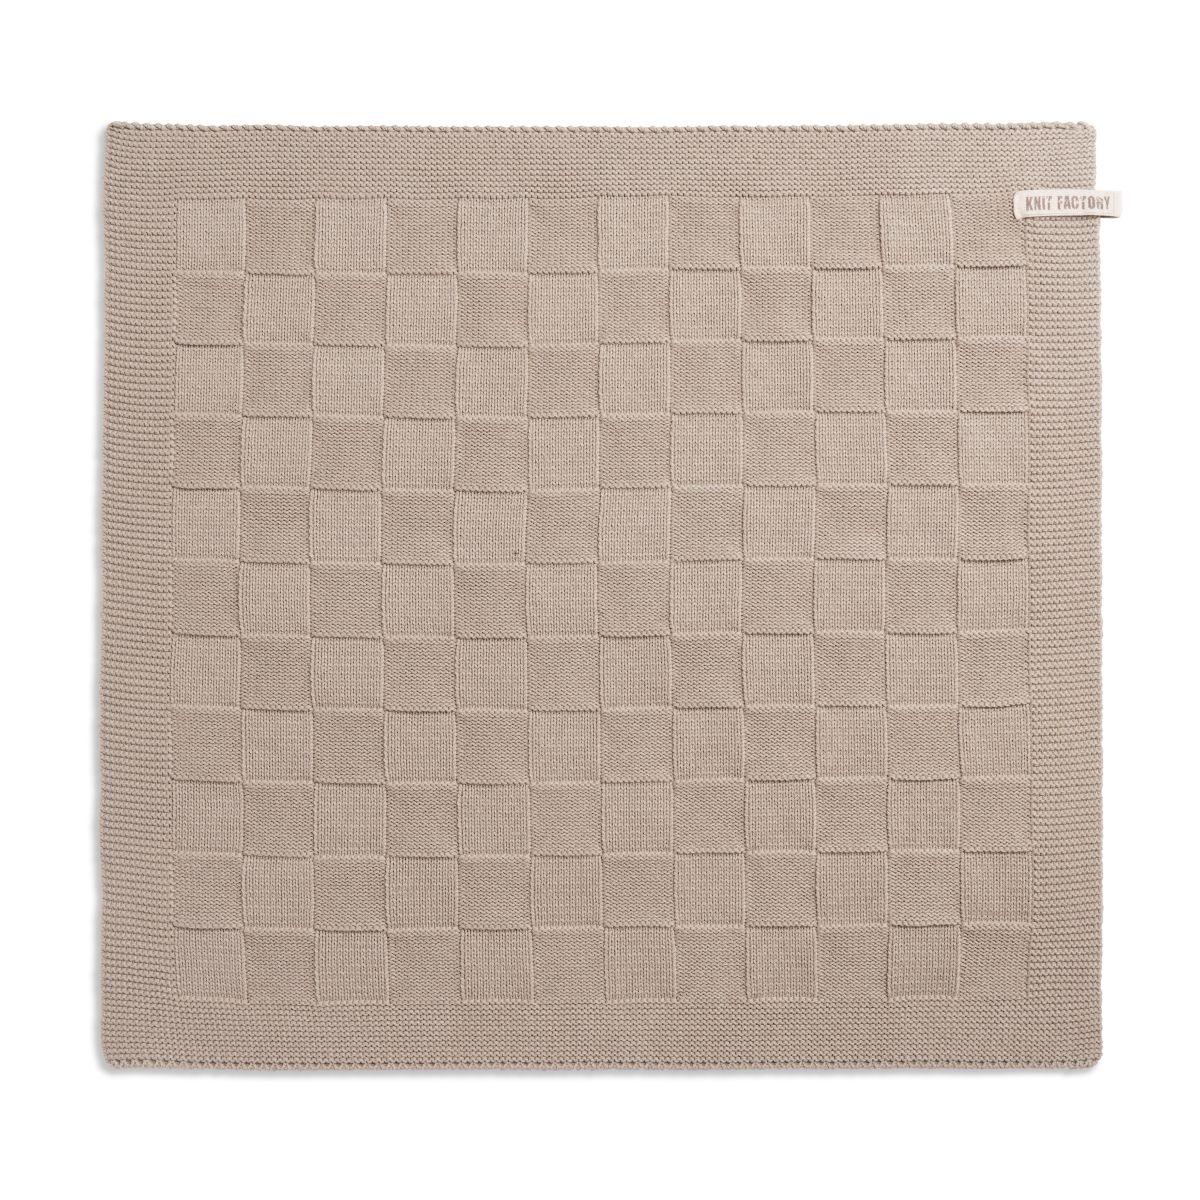 knit factory 2000028 keukendoek grote blok uni linnen